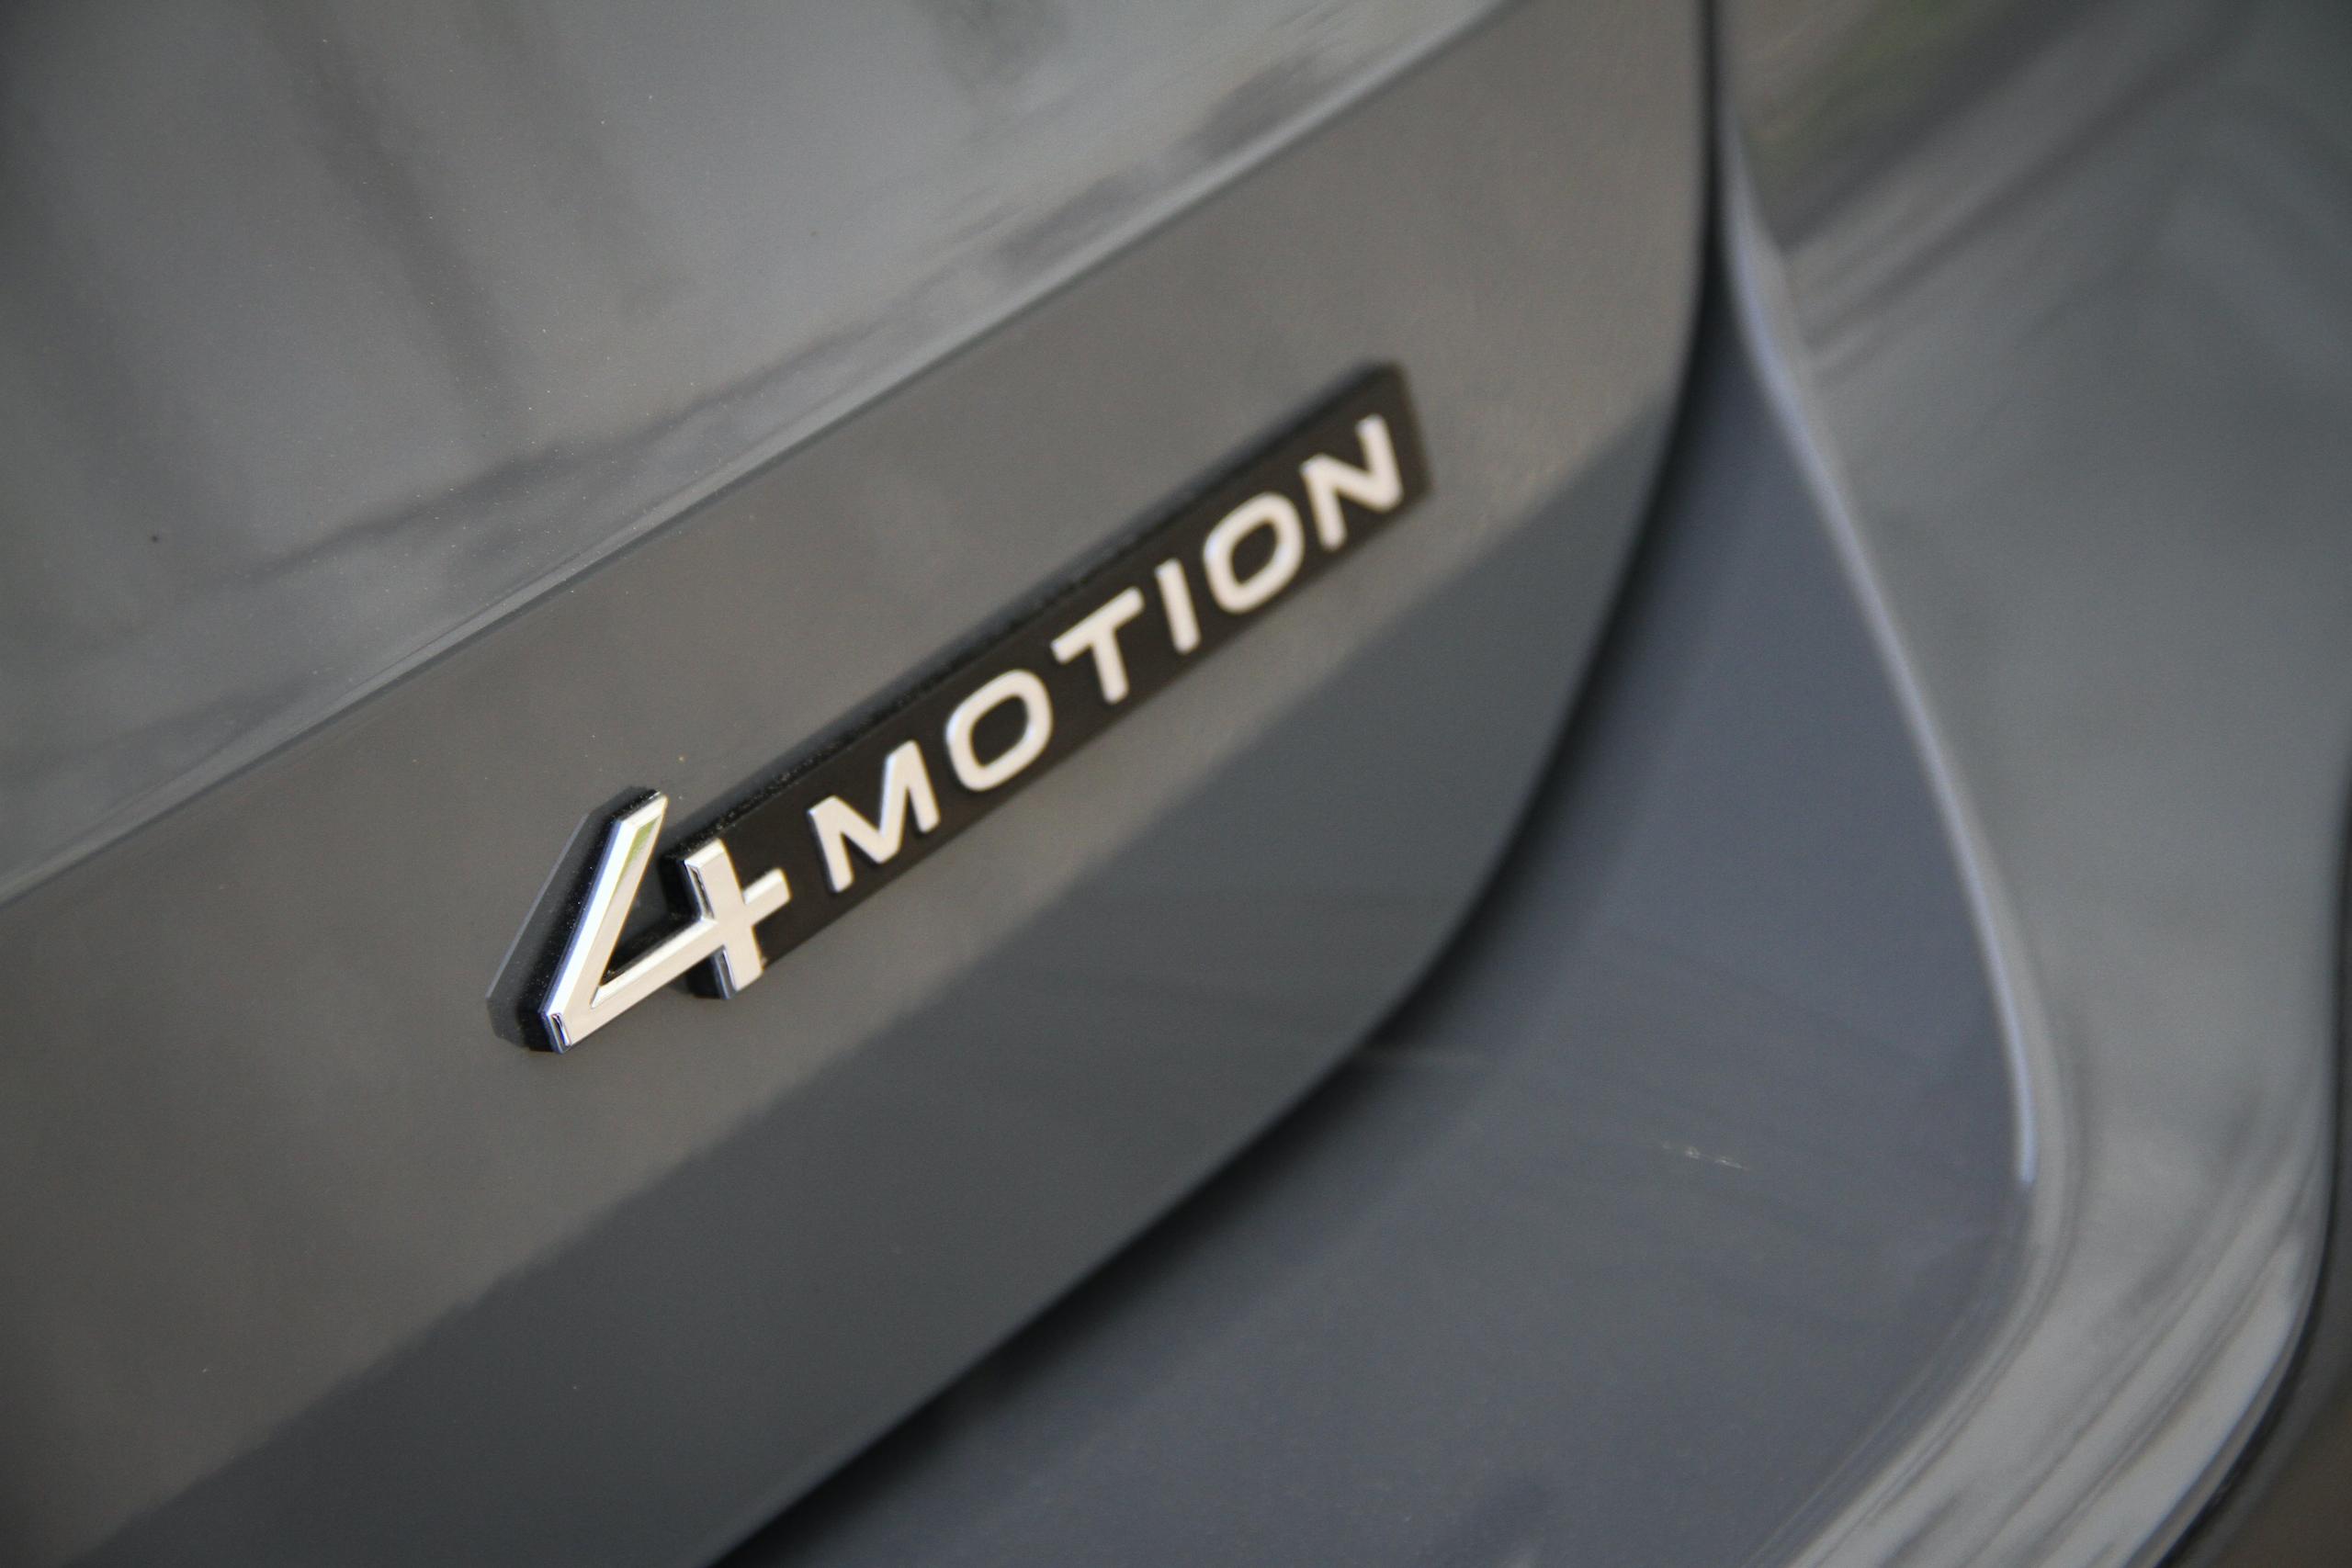 2022 Volkswagen Taos SEL AWD 4motion badge